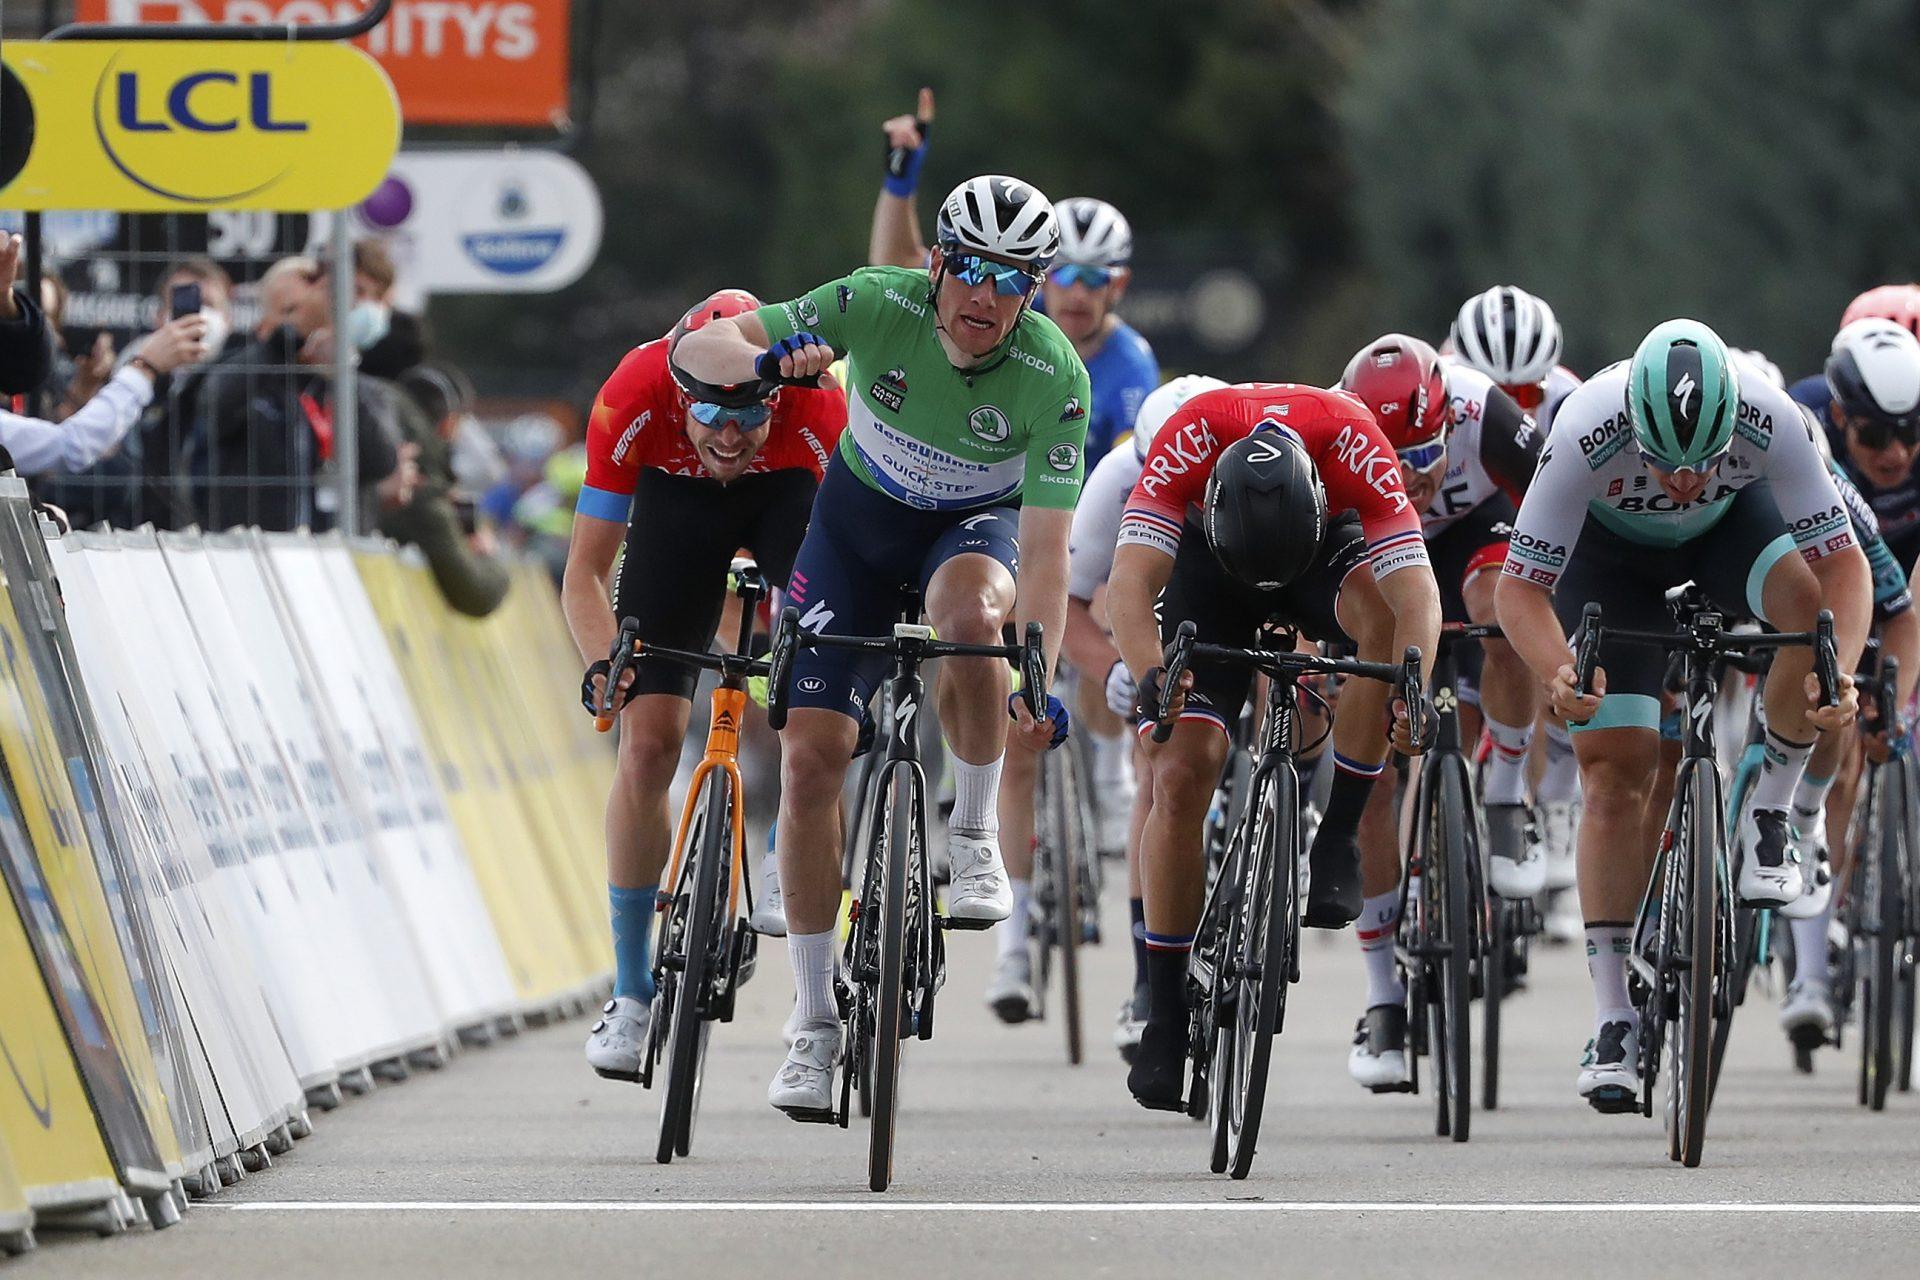 Sam Bennett slaví triumf v 5. etapě závod Paříž-Nice. Foto: © Deceuninck - Quick-Step - ©Bas Czerwinski